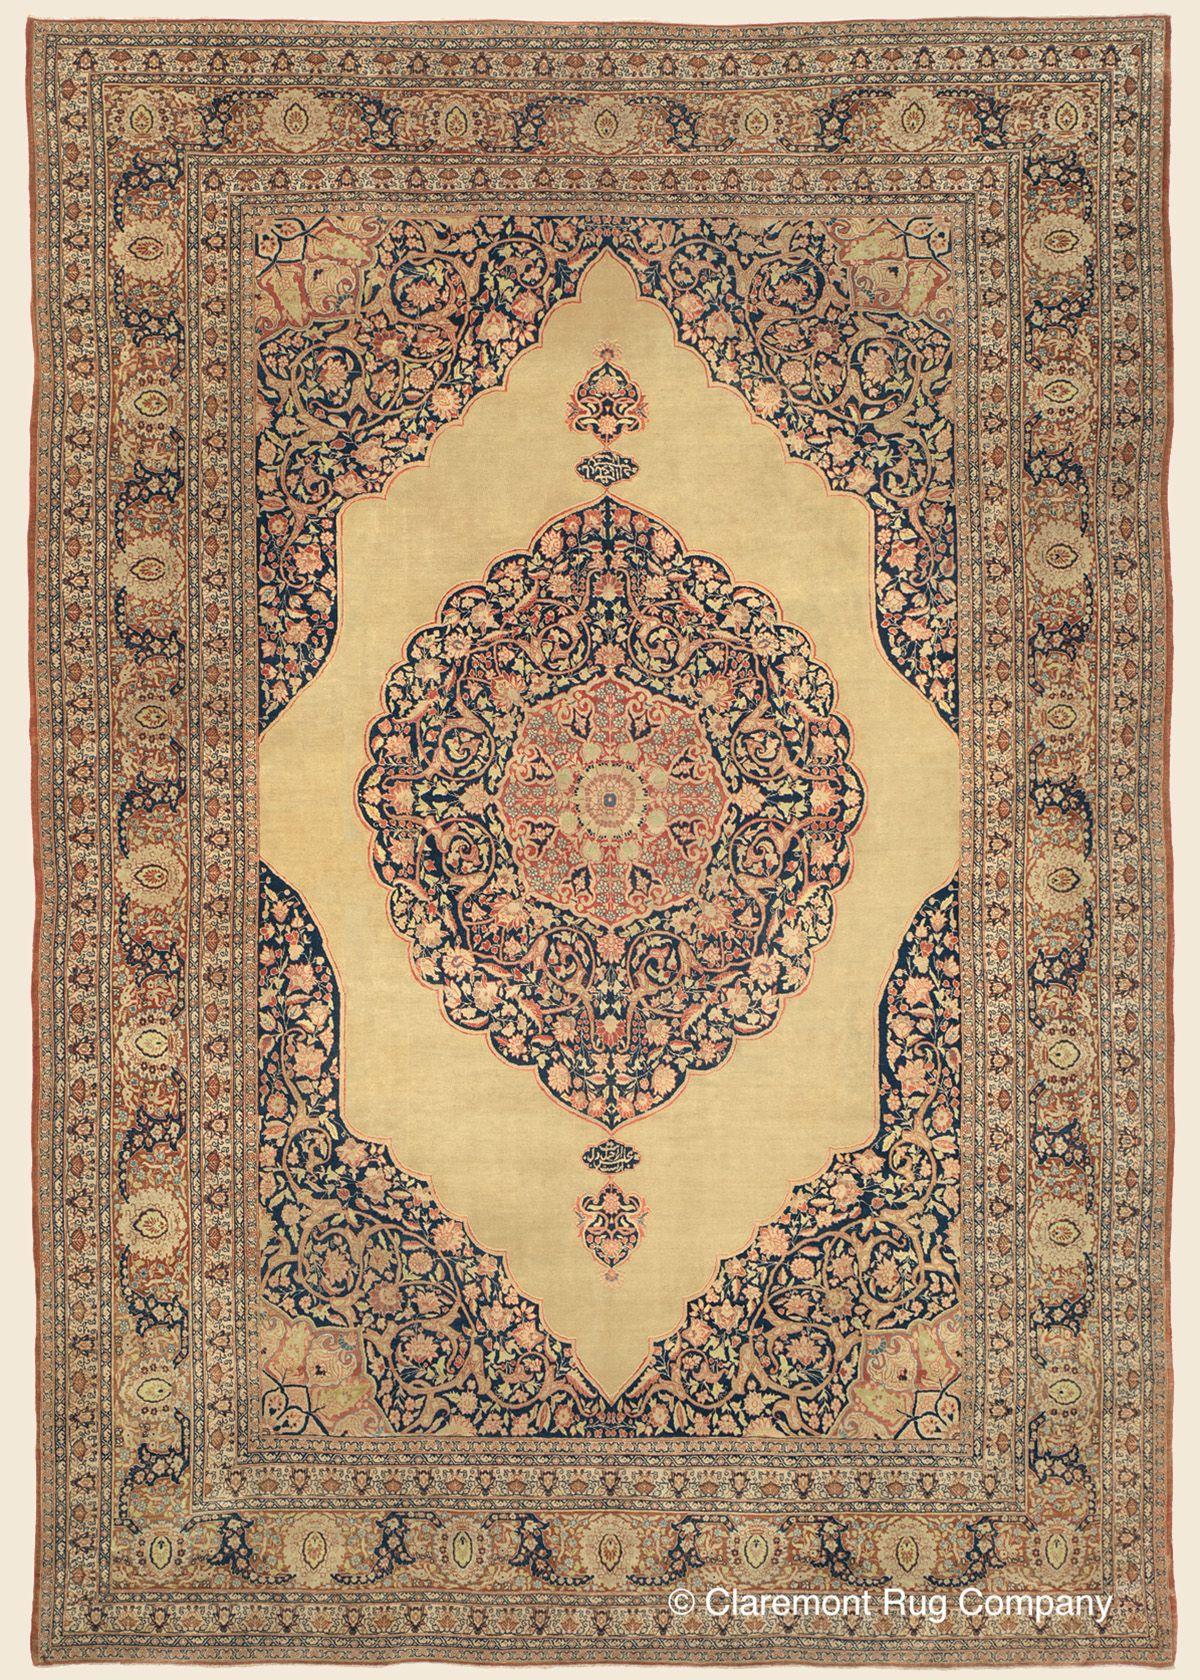 Tabriz Northwest Persian Antique Rug 9 1 X 13 3 Circa 1900 Claremont Rug Company Rugs Persian Rug Designs Rugs On Carpet